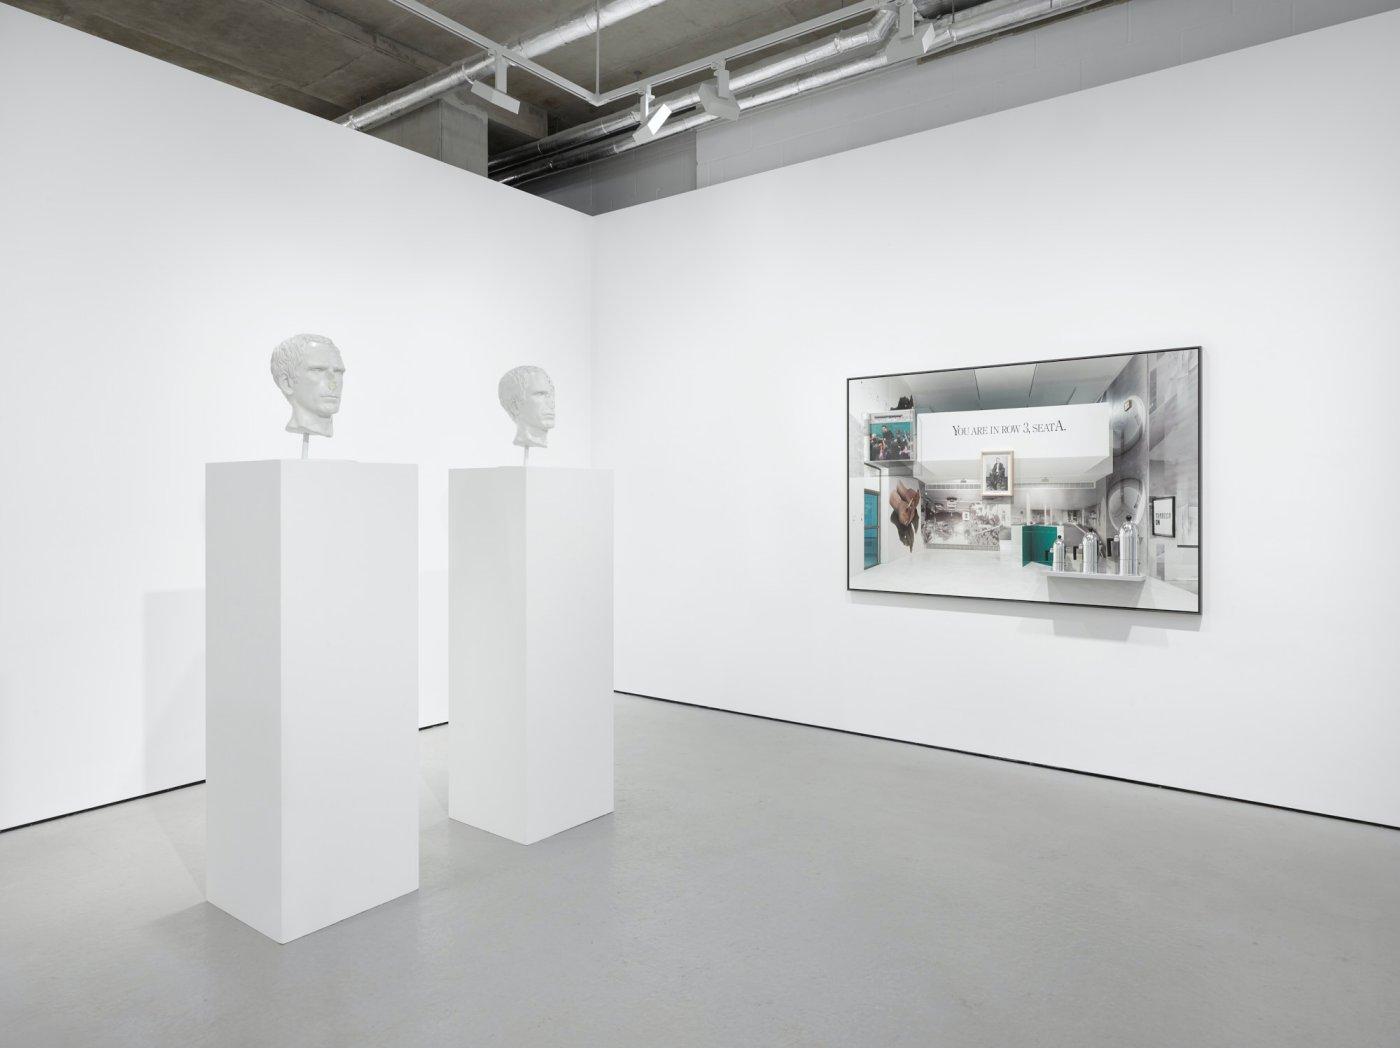 Lisson-Gallery-Cork-St-Jonathan-Monk 3